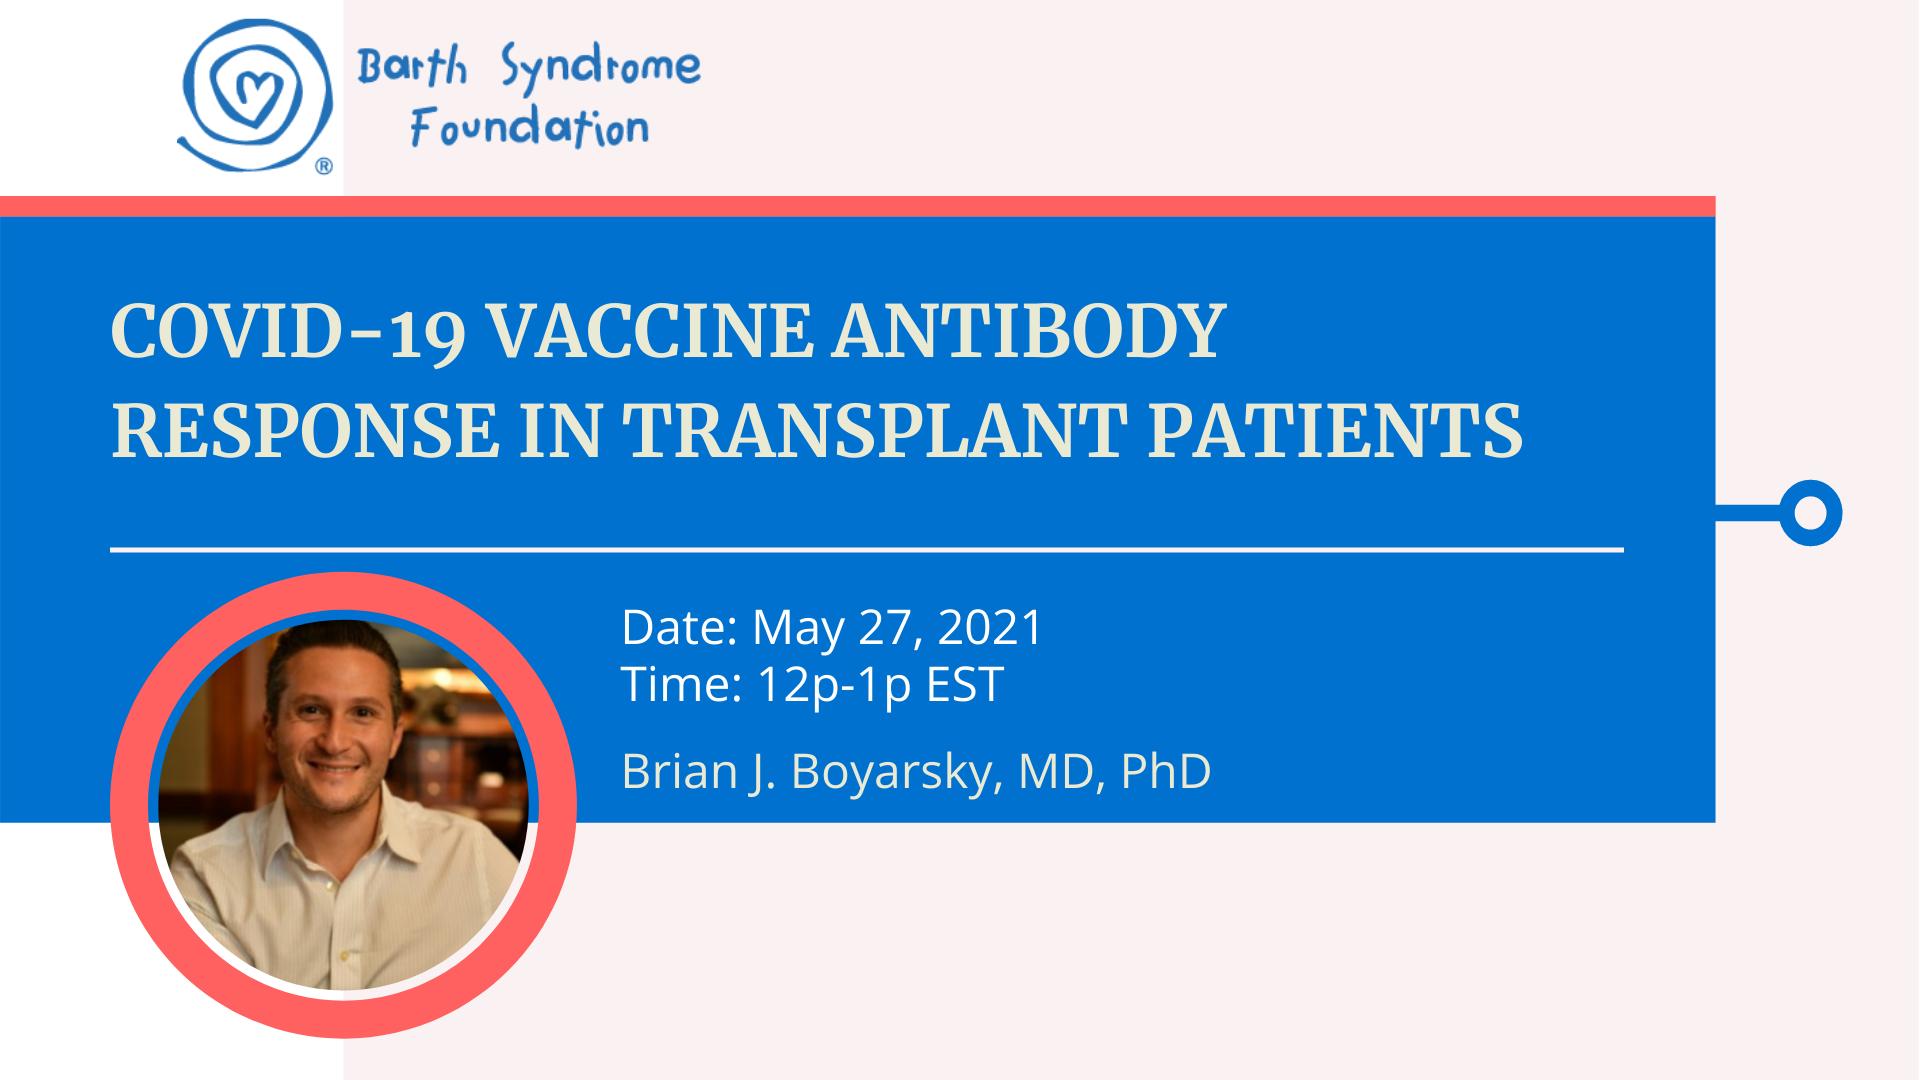 Webinar: COVID-19 Vaccine Antibody Response in Transplant Patients